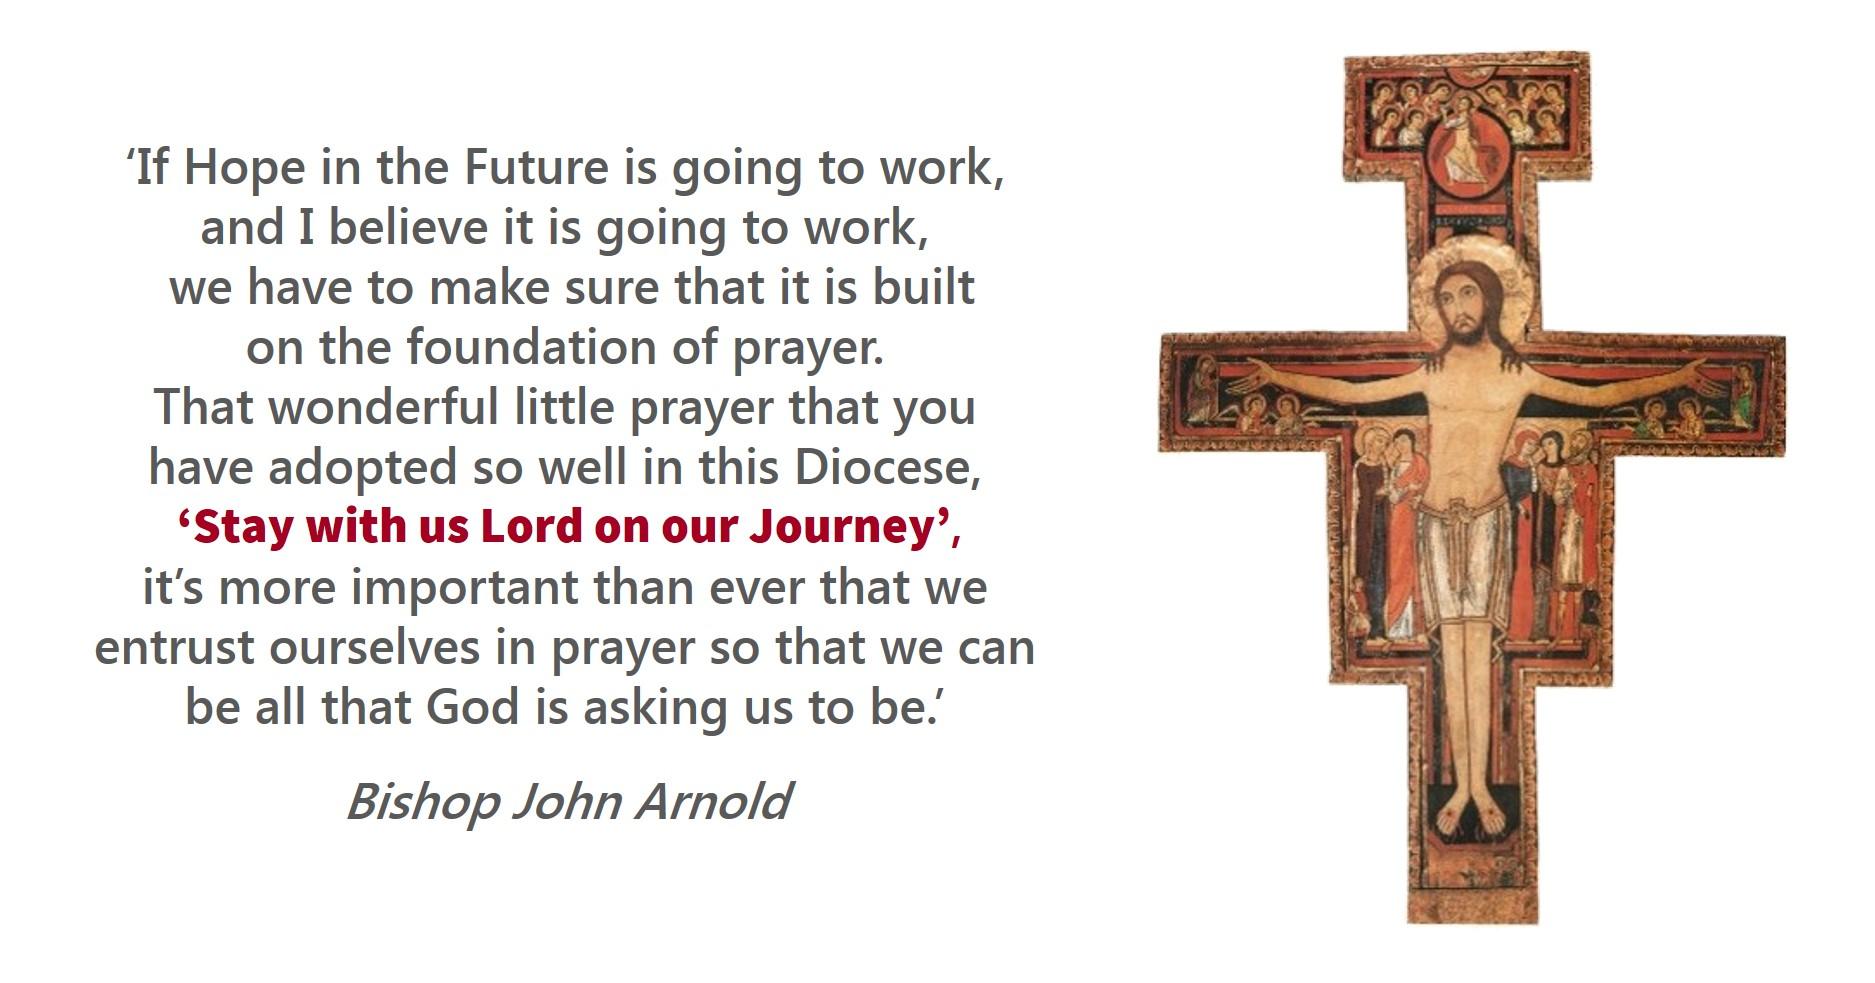 Prayer - Roman Catholic Diocese Of Salford regarding Daily Mass Intercessions 2021